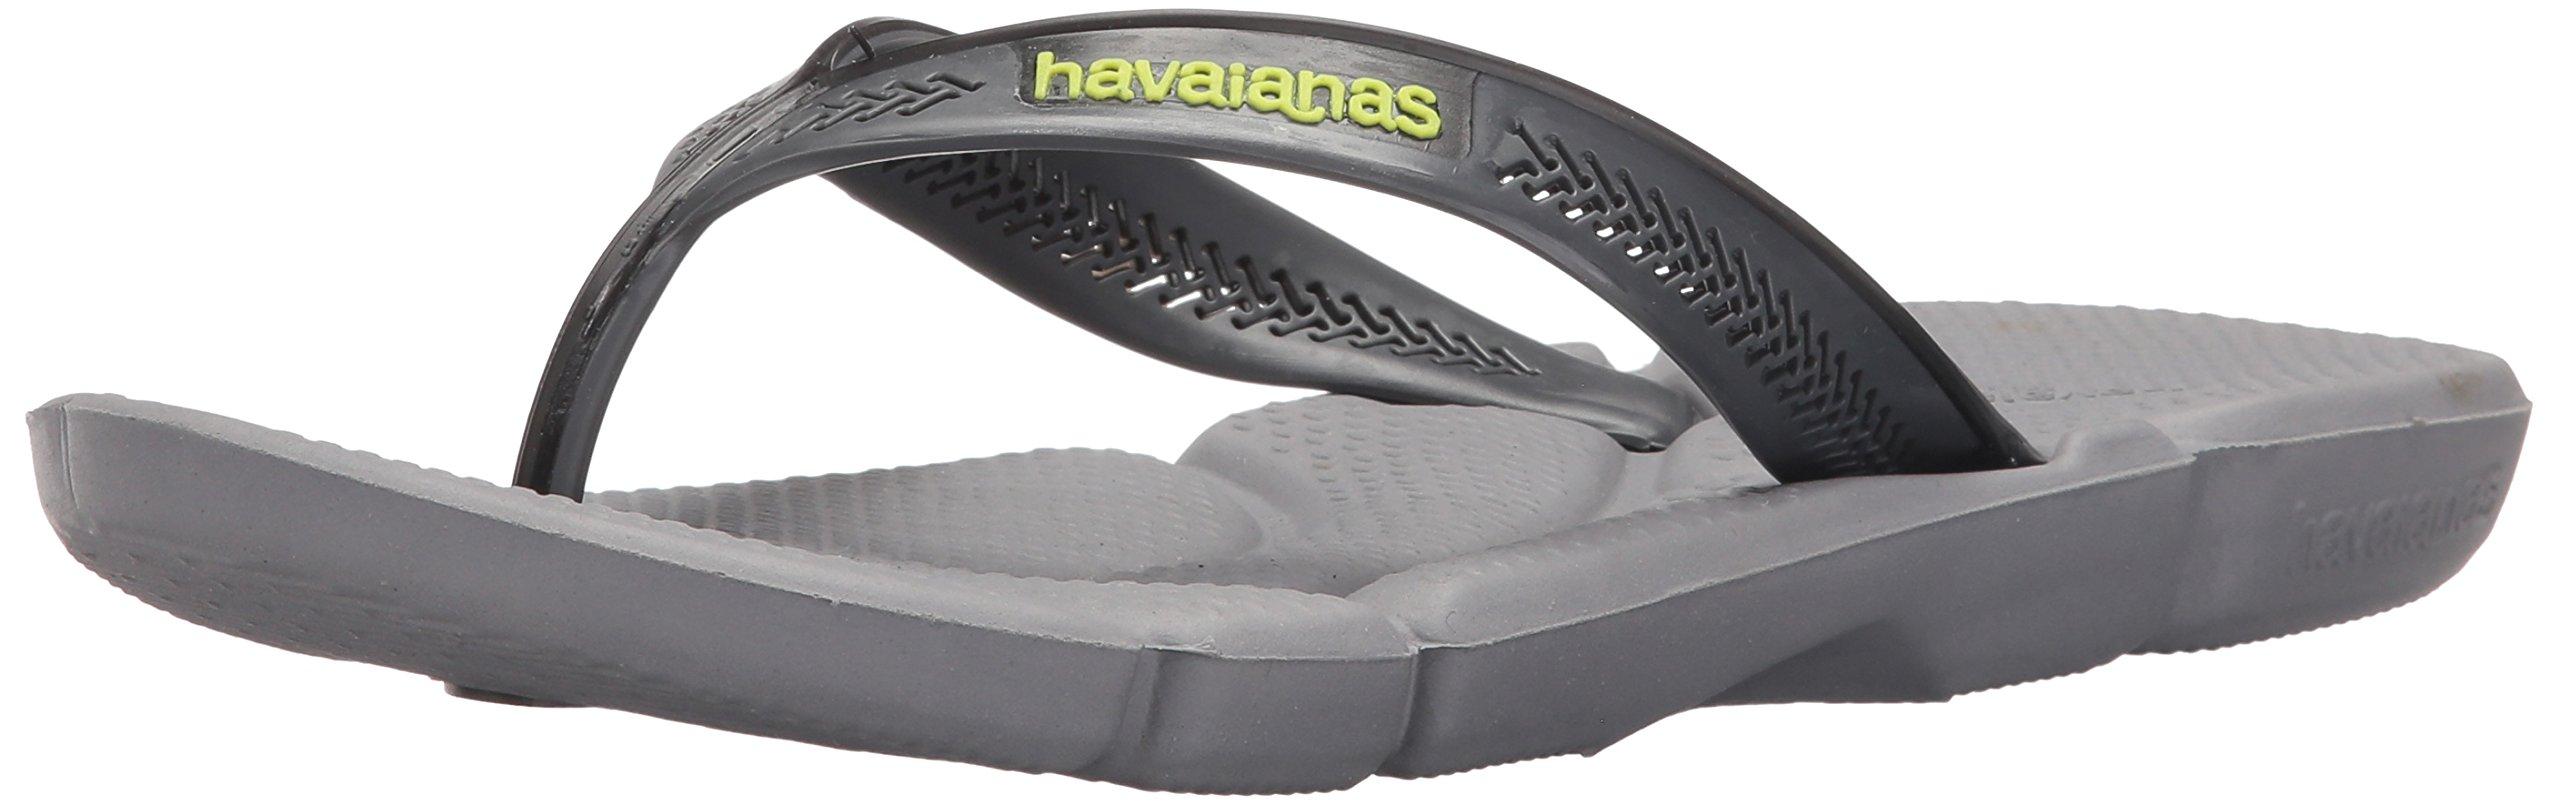 b3a8b30387da82 Galleon - Havaianas Men s Power Flip Flop Sandals